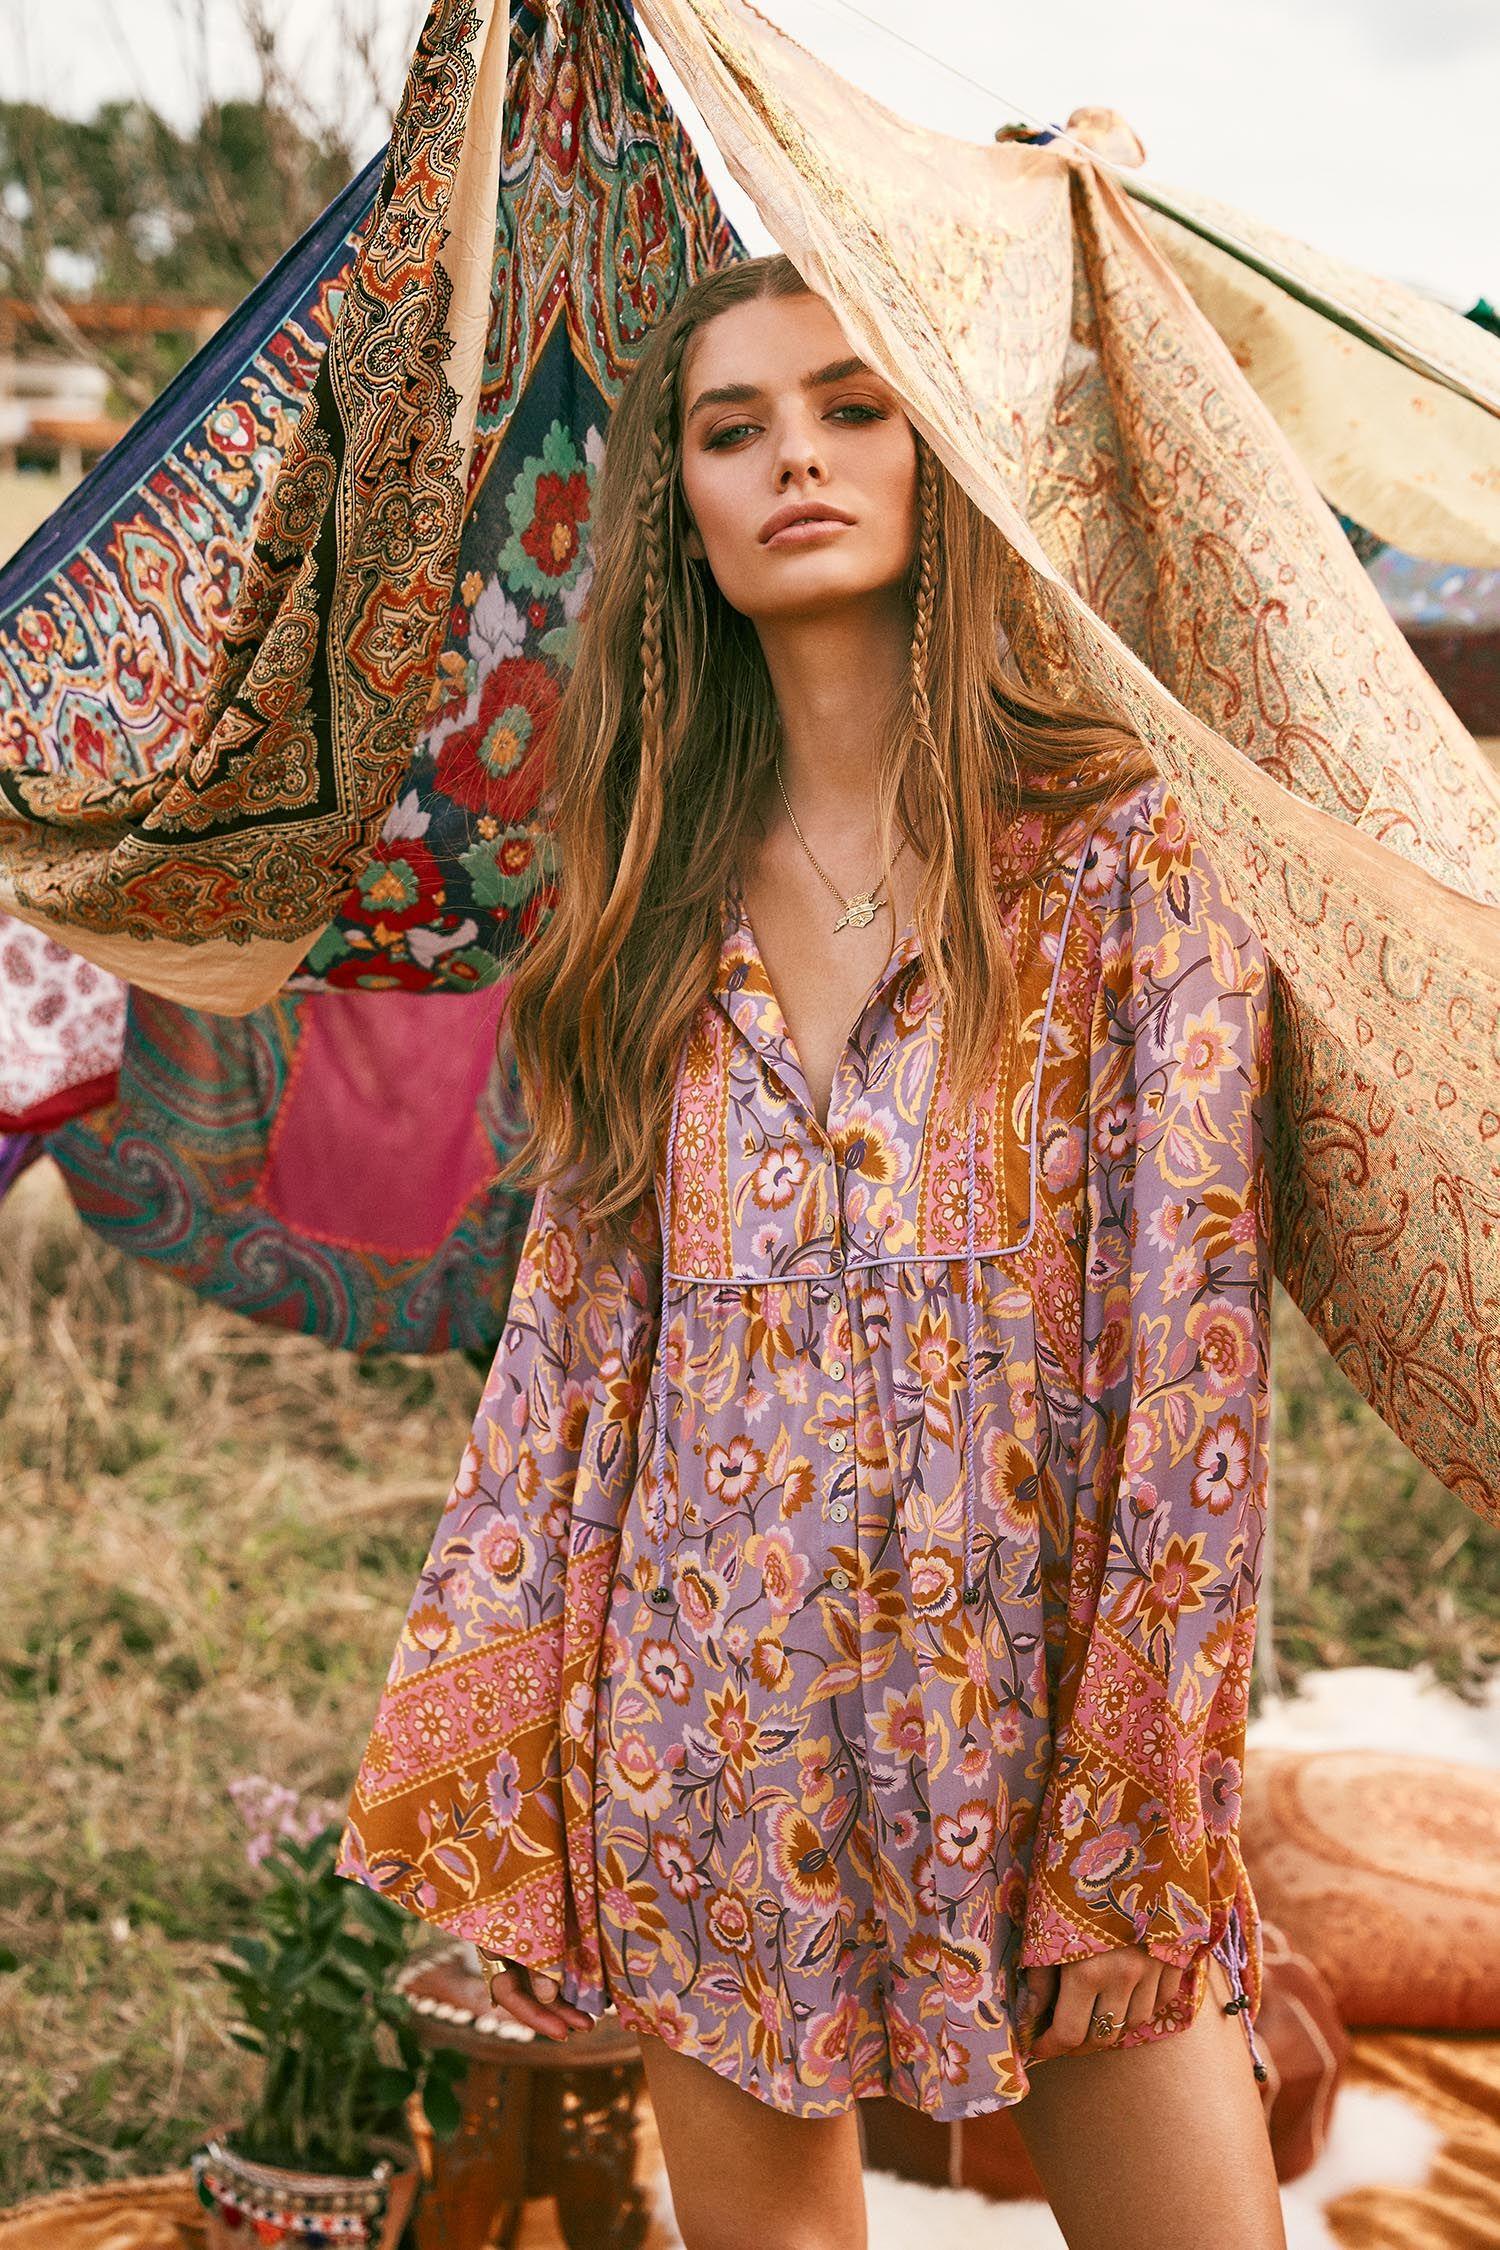 Hippie chicks pictures — photo 9